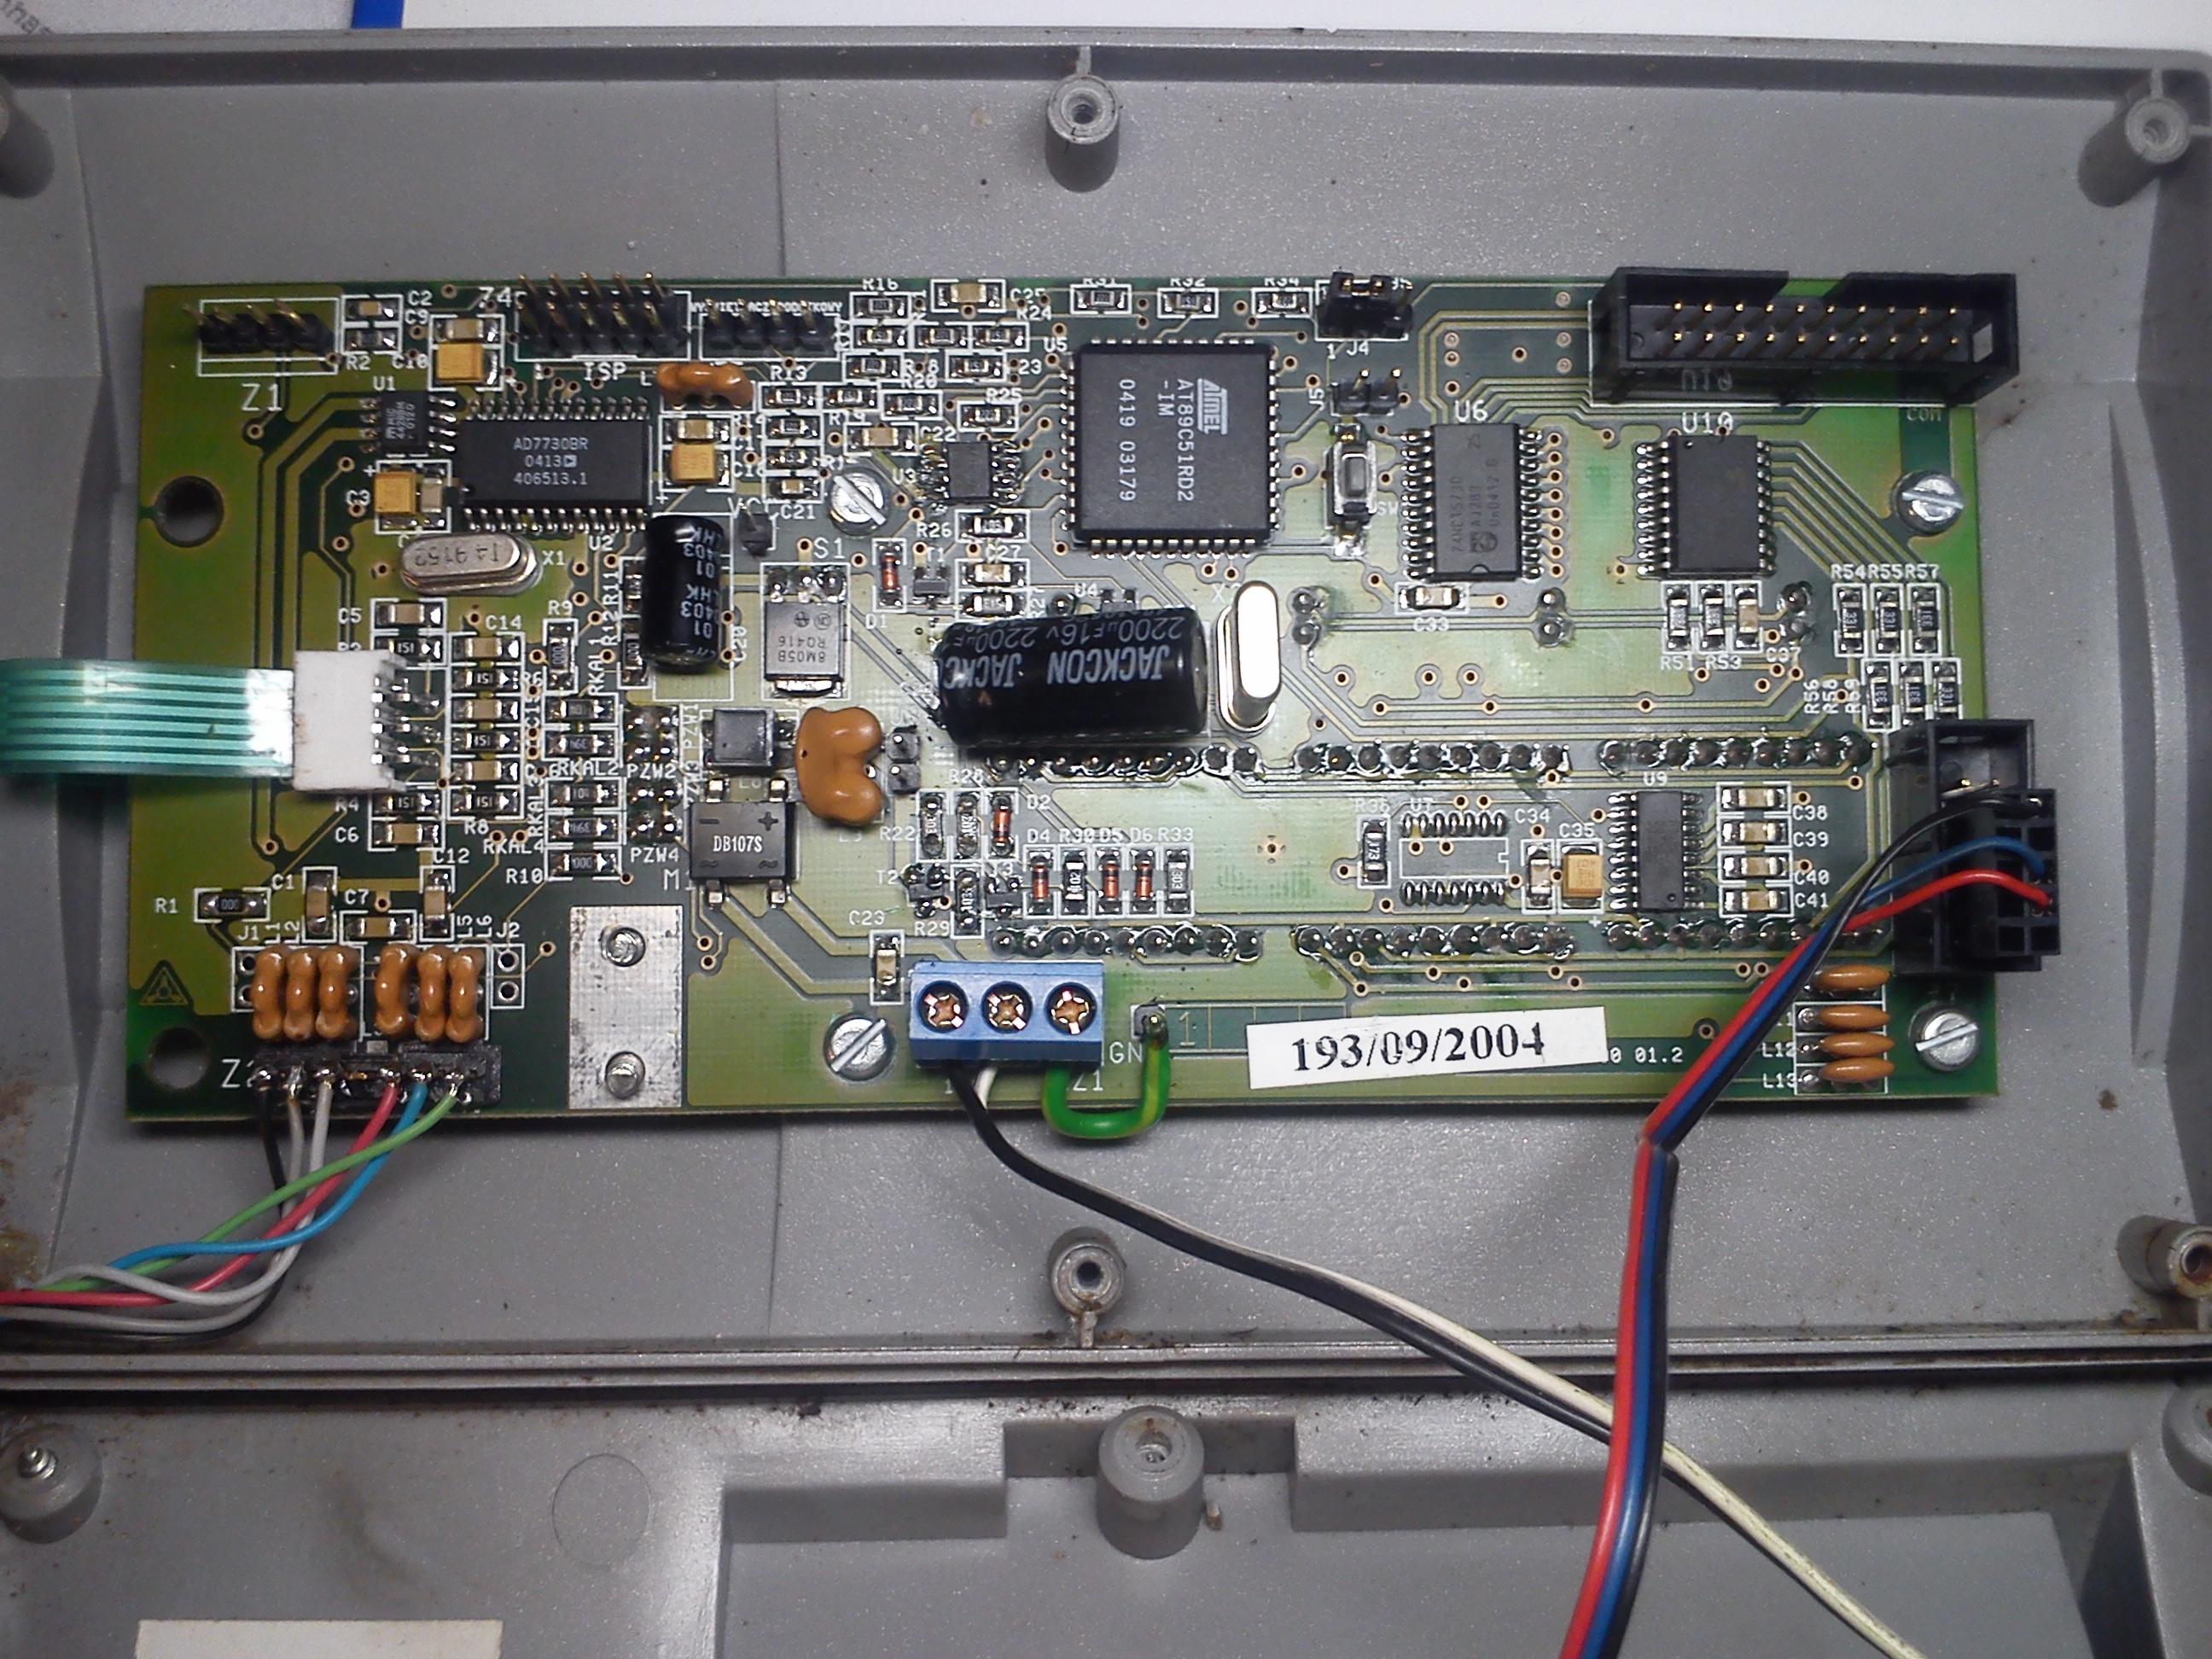 Waga FAWAG TP 150/1   - miernik ZOT-3 brak mo�liwo�ci kalibracji